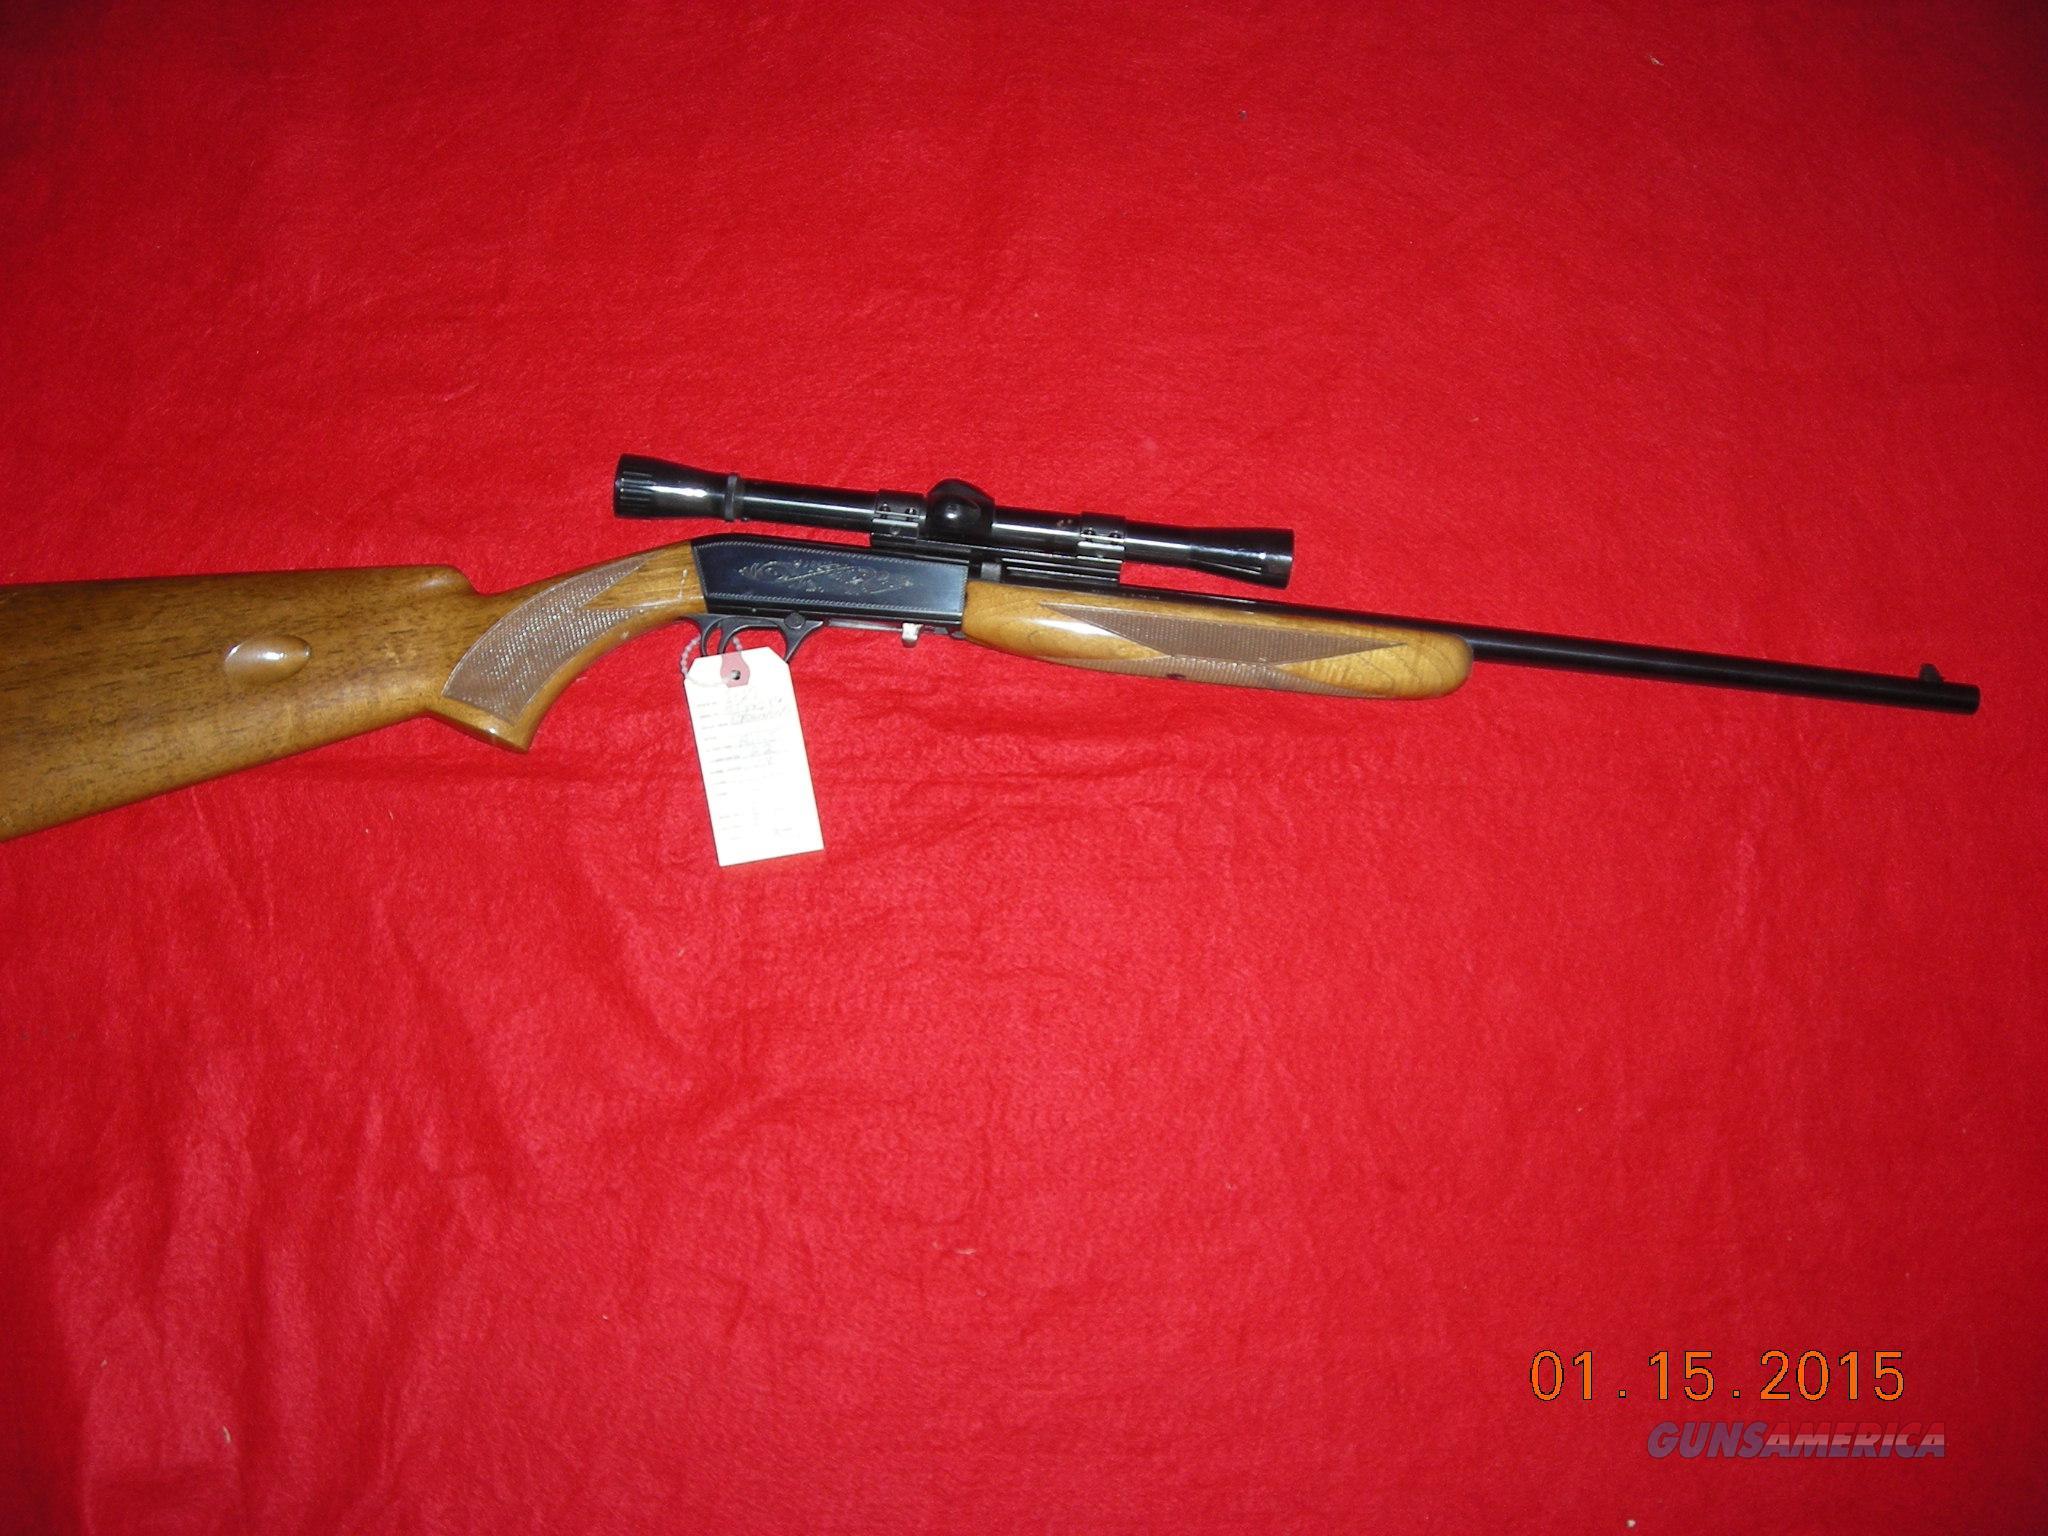 BROWNING 22LR SEMI   Guns > Rifles > Browning Rifles > Semi Auto > Hunting